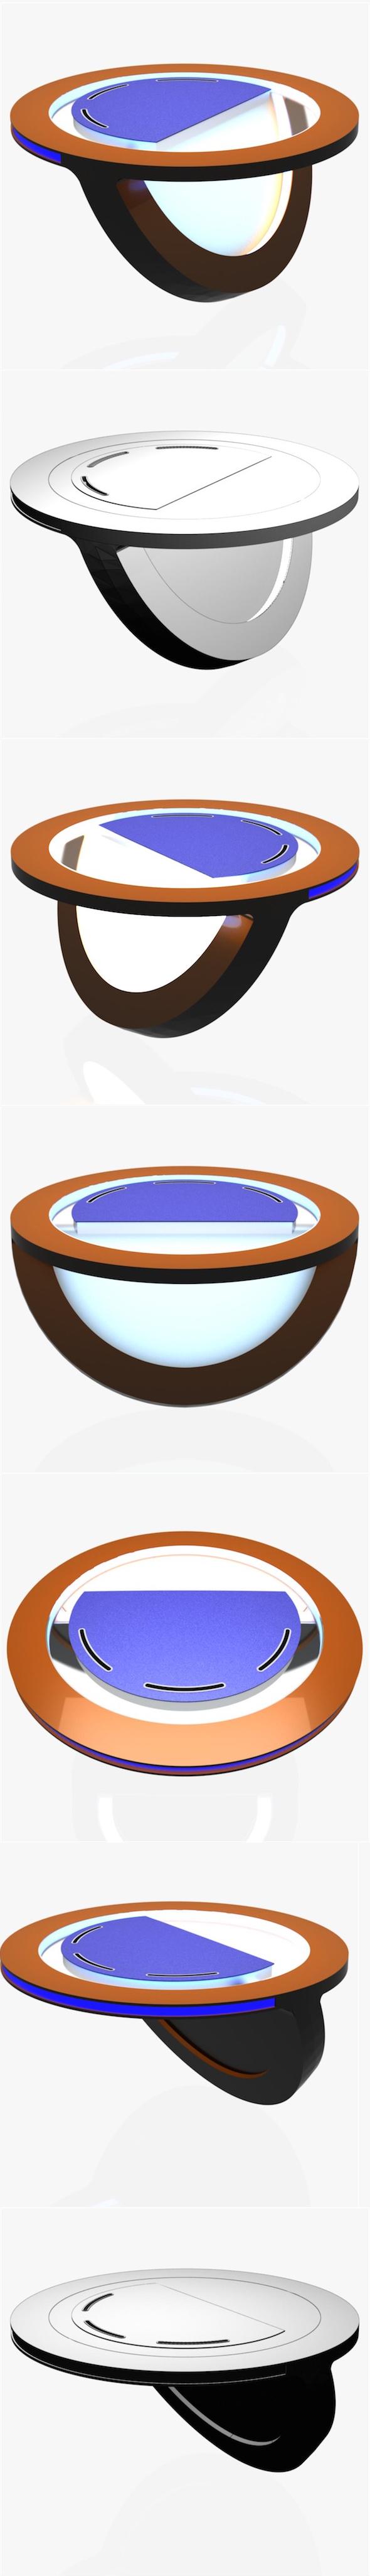 Virtual Tv Studio News Desk 10 - 3DOcean Item for Sale